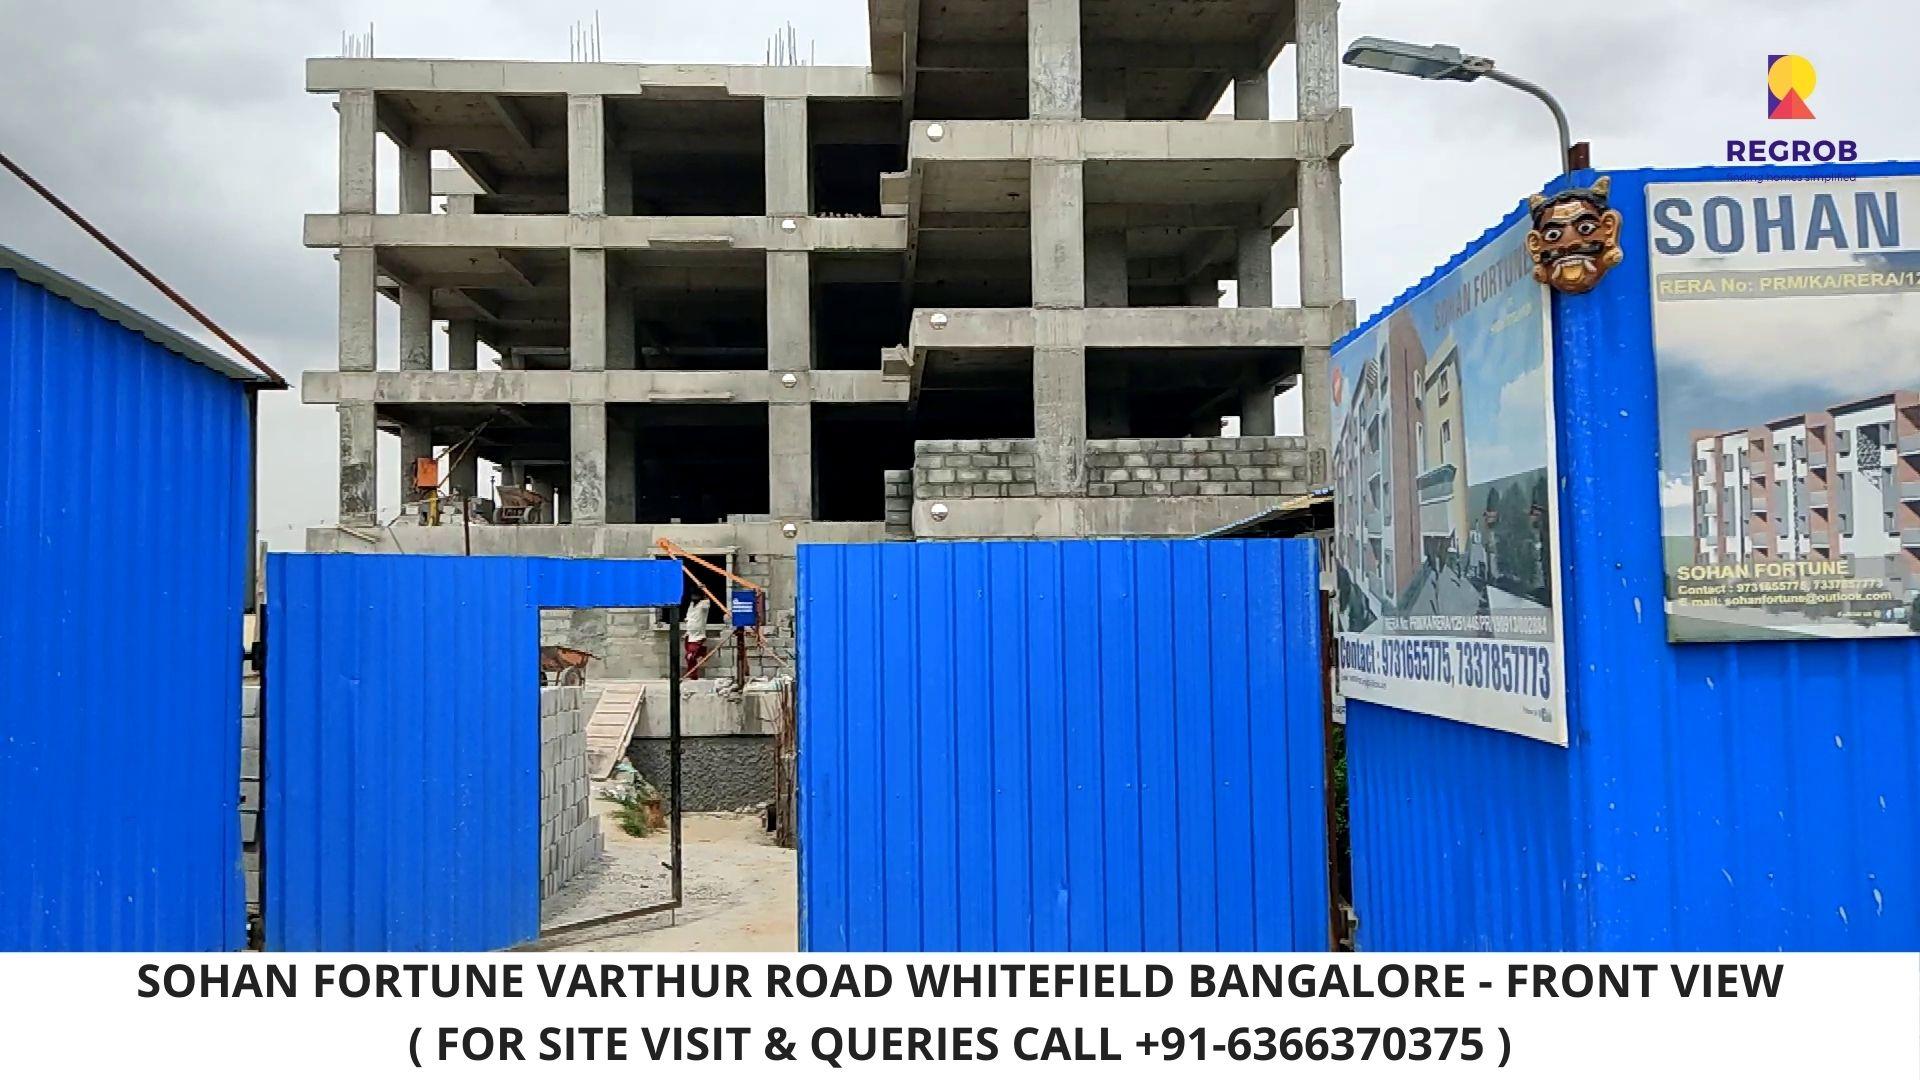 Sohan fortune Varthur Road Whitefield Bangalore